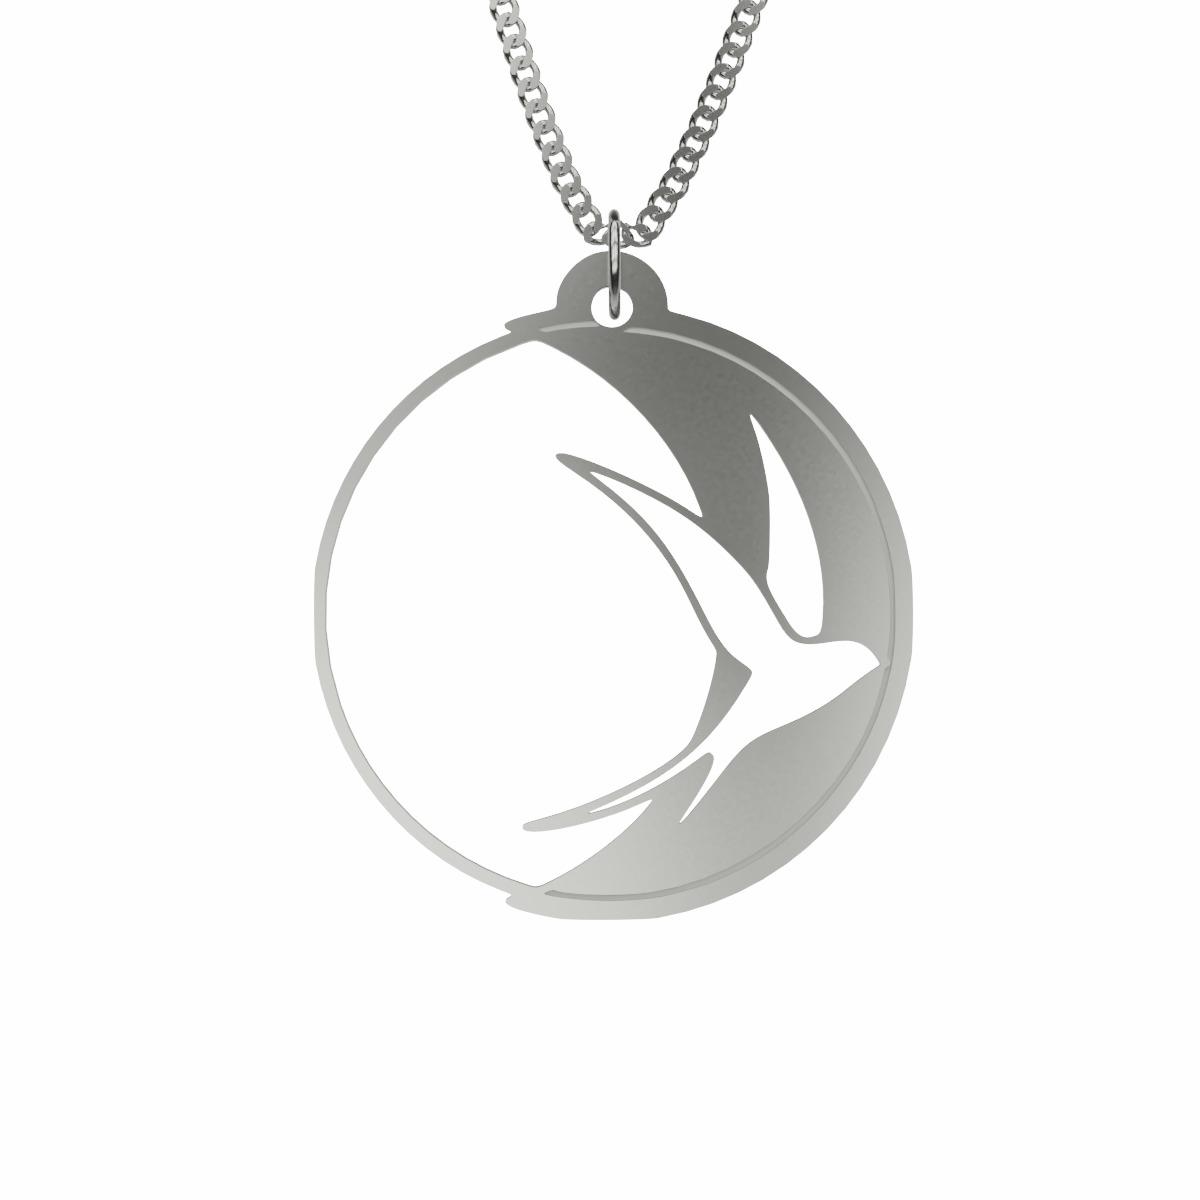 Silver Swallow Bird Pendant Necklace (Andorinha Moon Edition) | 925 Solid  Sterling Silver